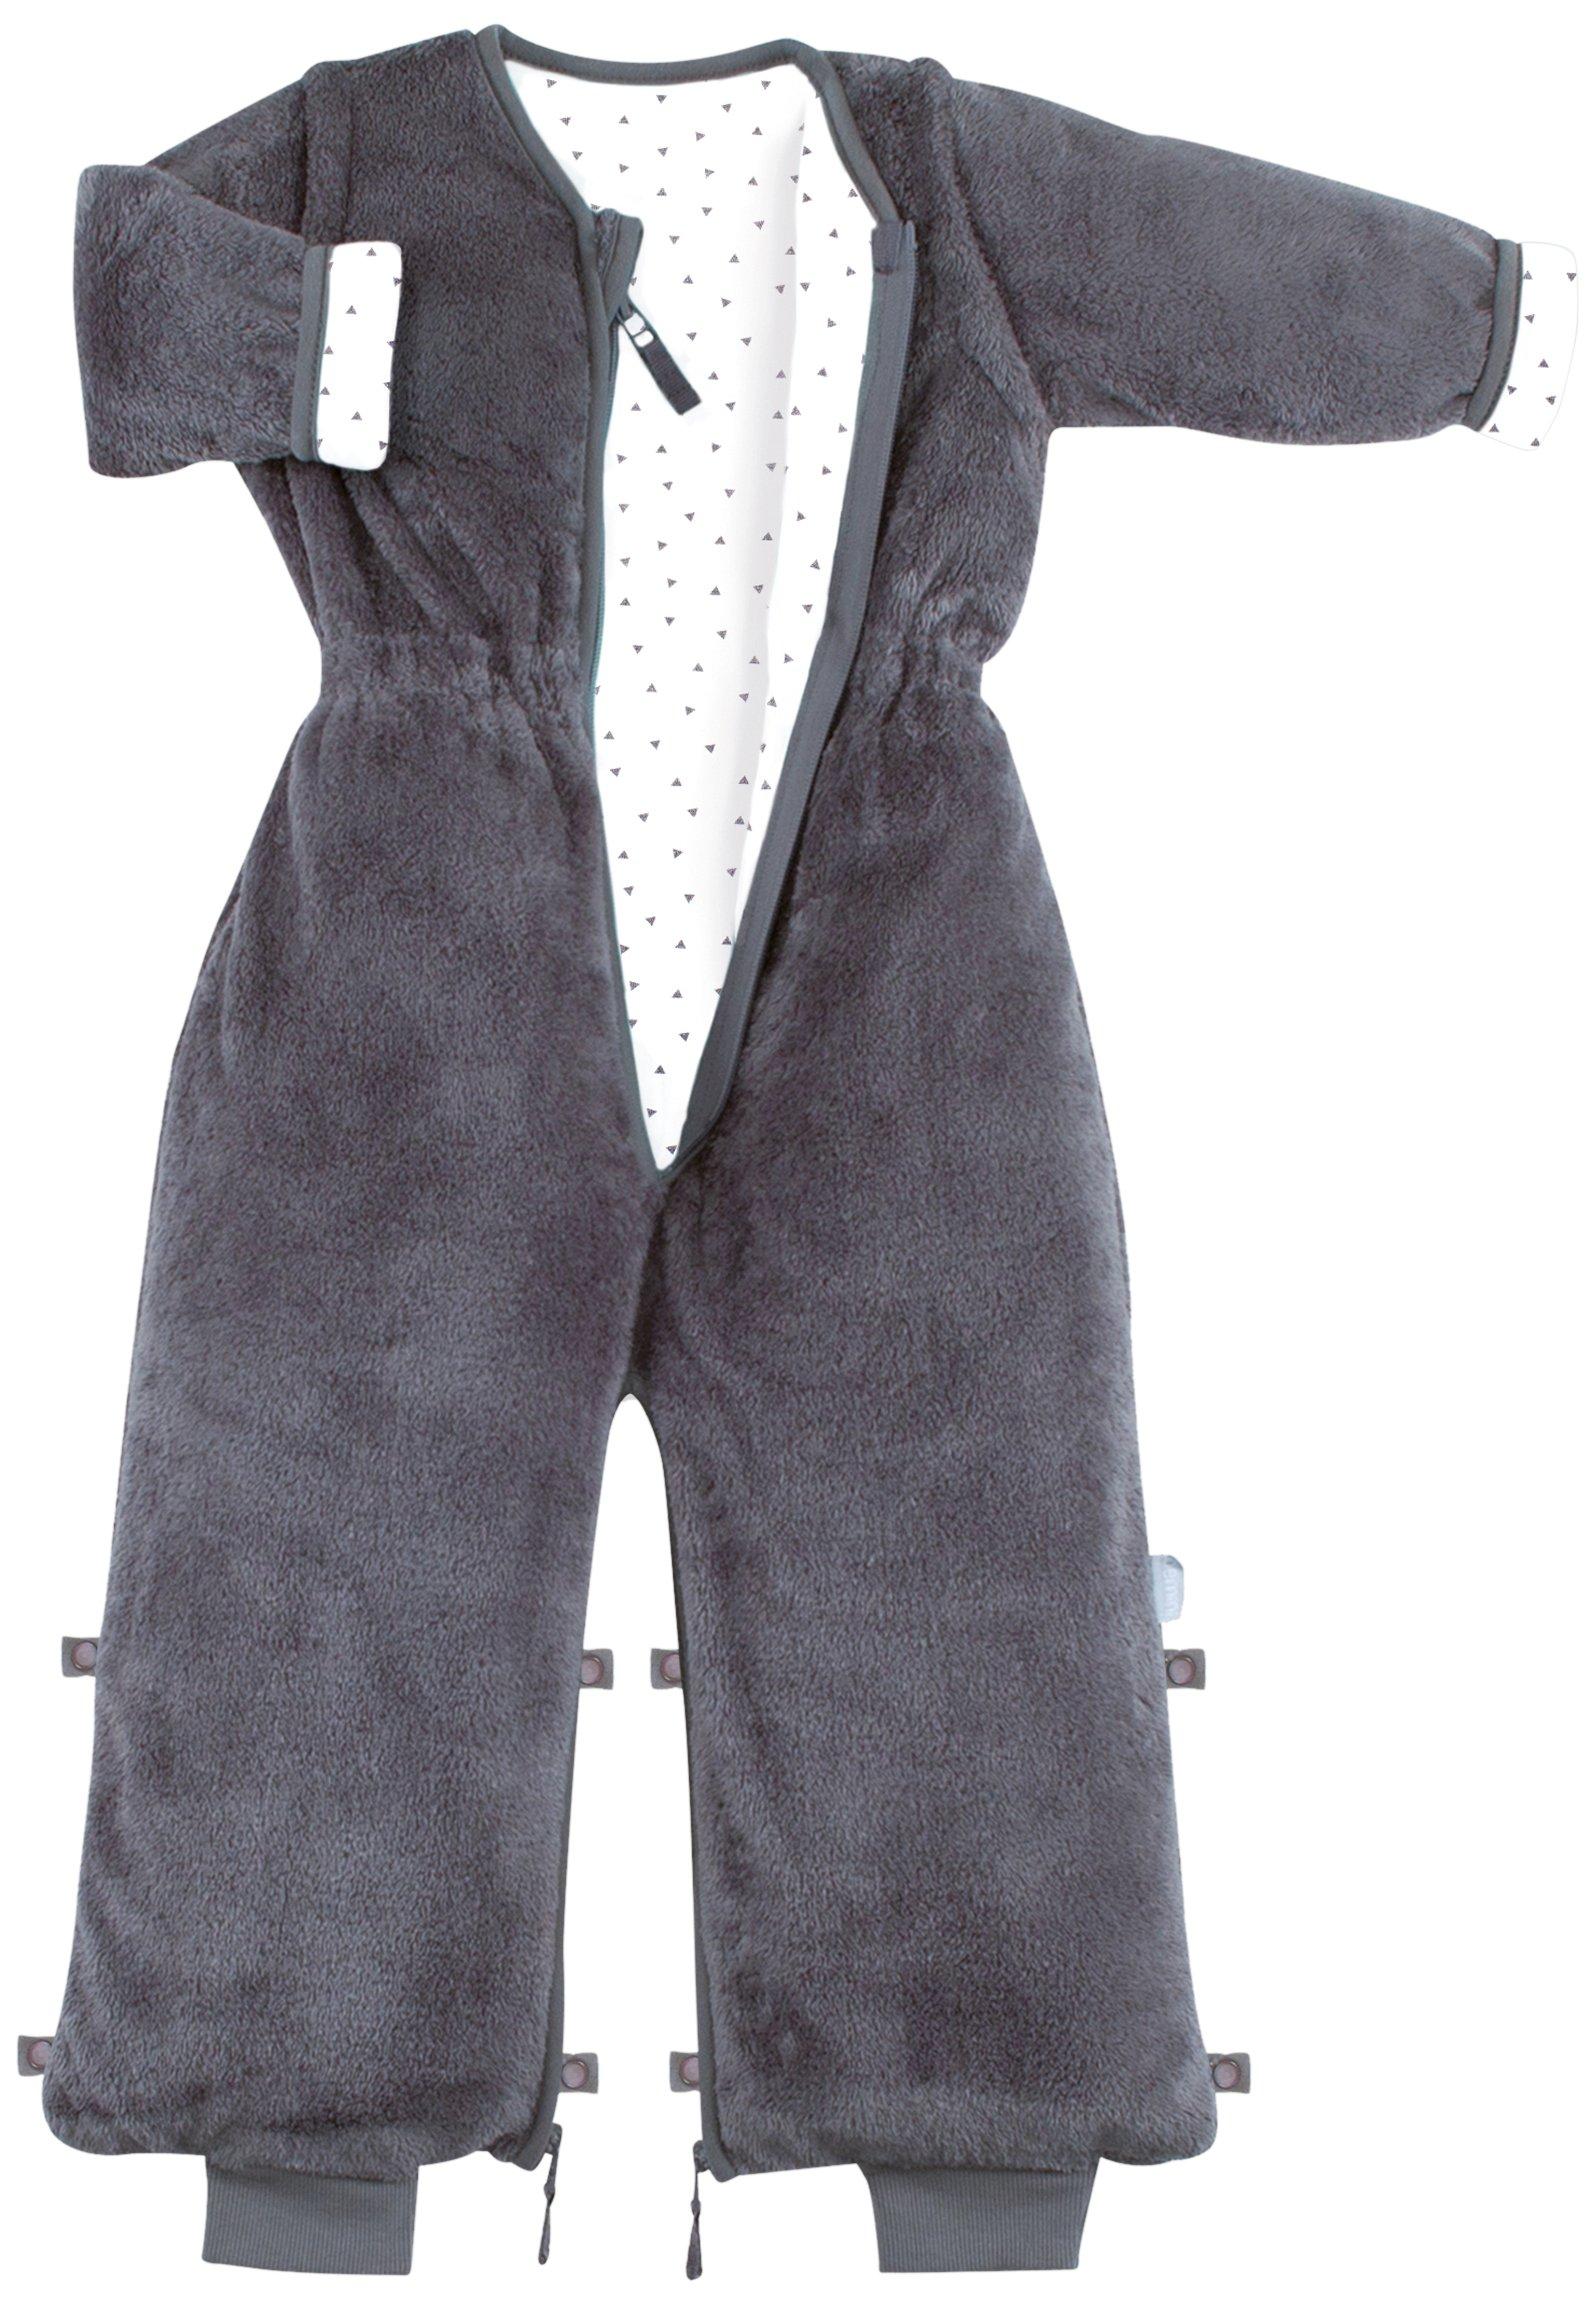 bemini número 94Softy Plus Jersey saco de dormir, 18A 36meses, bmini Pingu